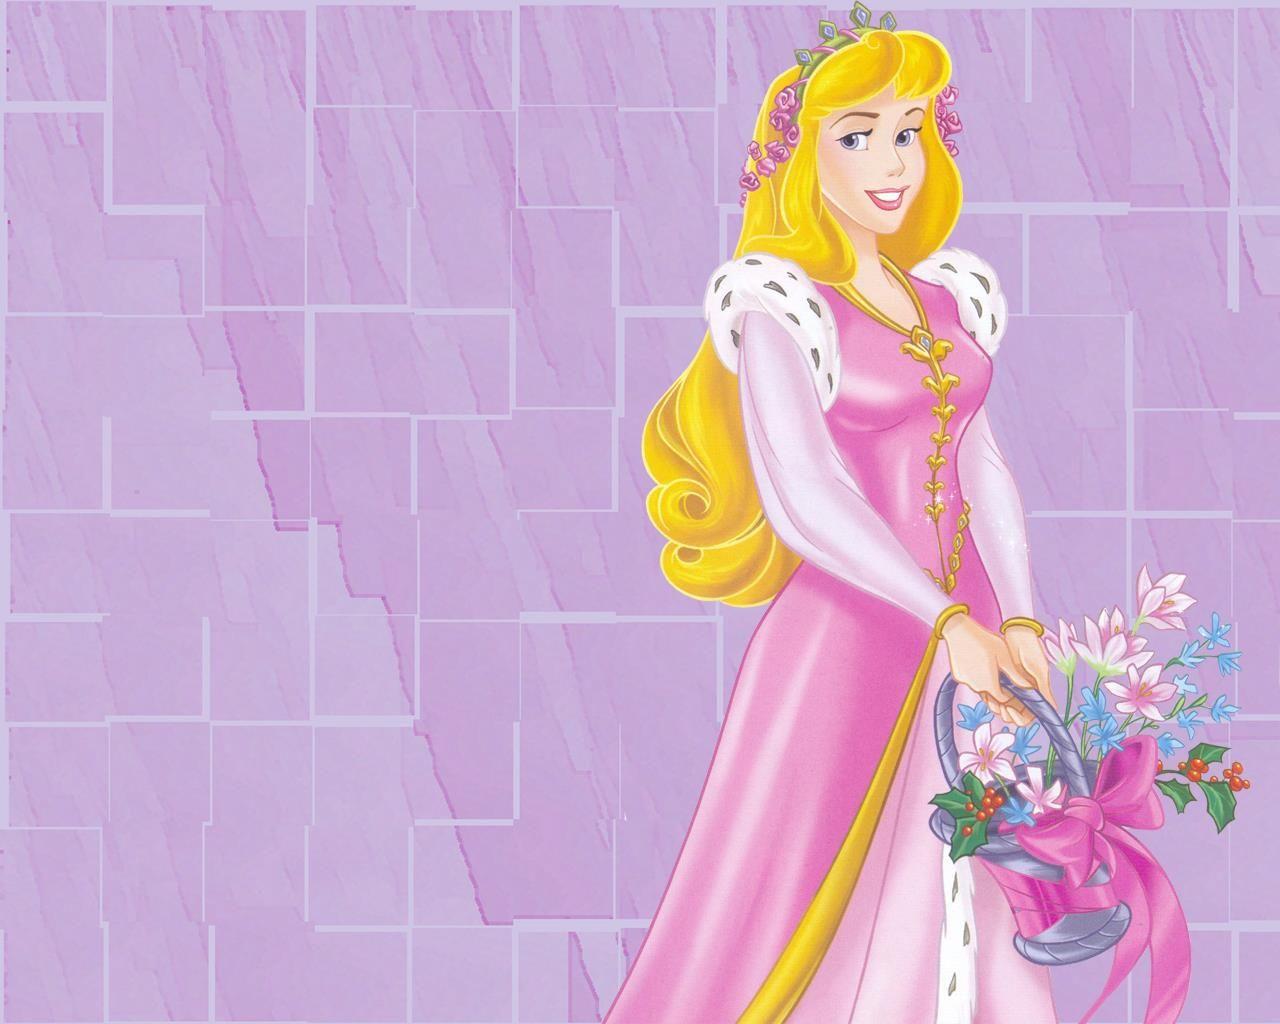 Princess Aurora Princess Aurora Disney Hd Wallpaper Background 1280 1024 1005869 Disney Princess Wallpaper Disney Princess Dresses Aurora Disney